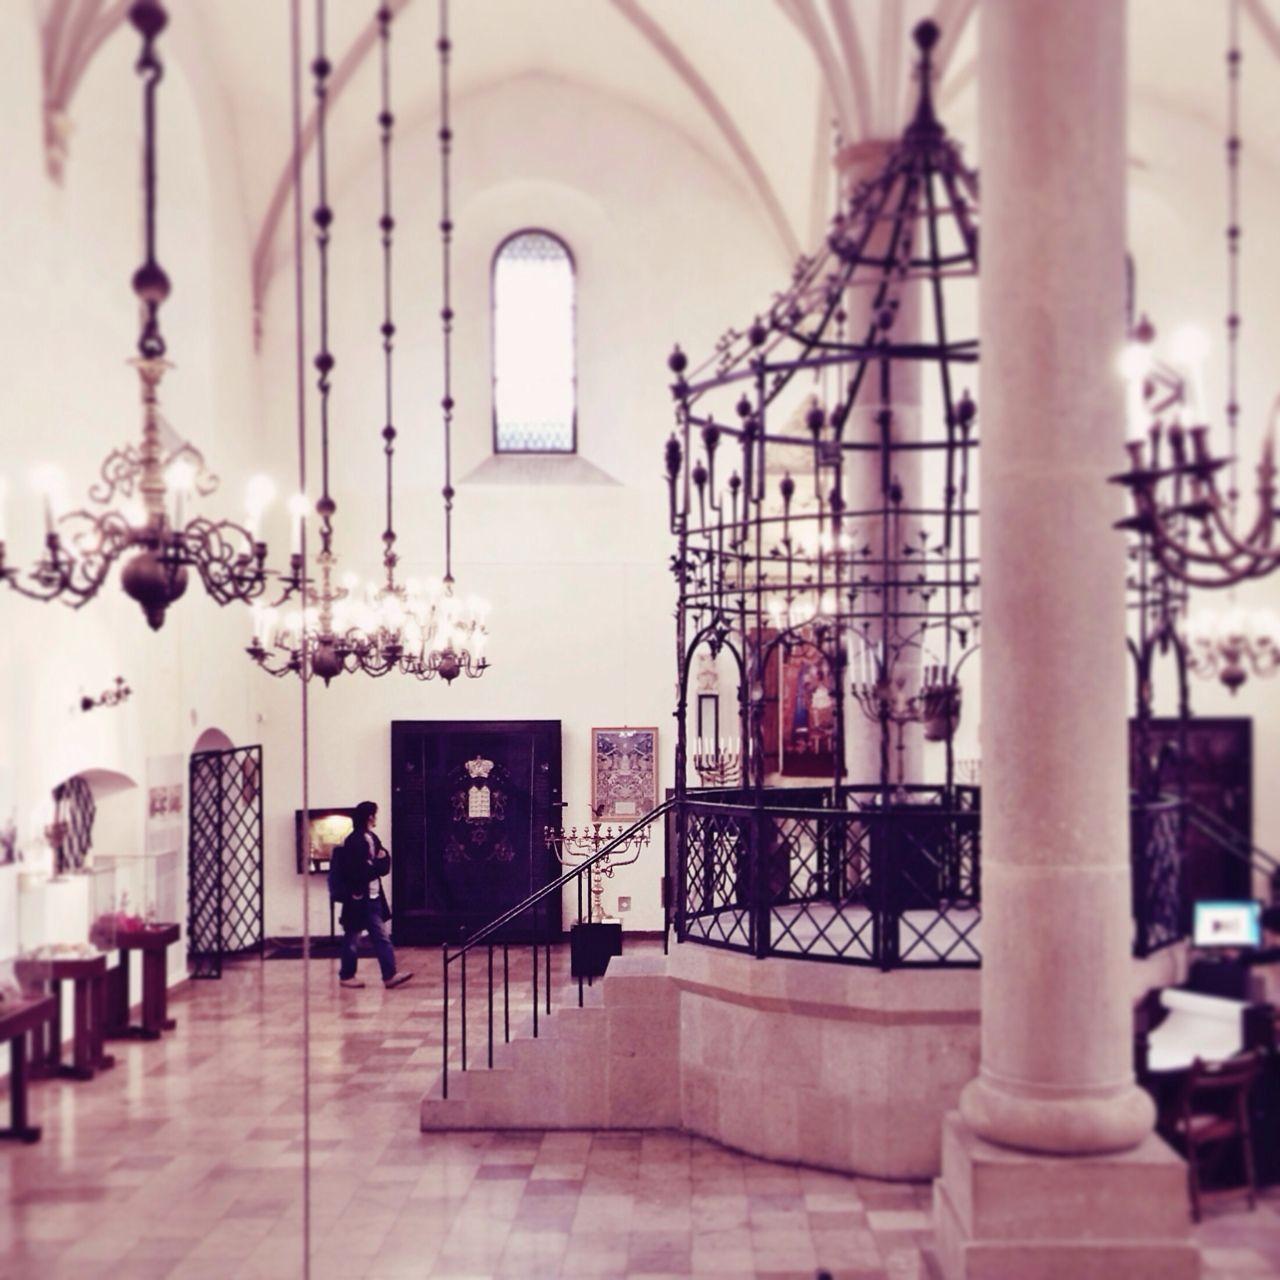 Poland, day 3 Stara Synagoga